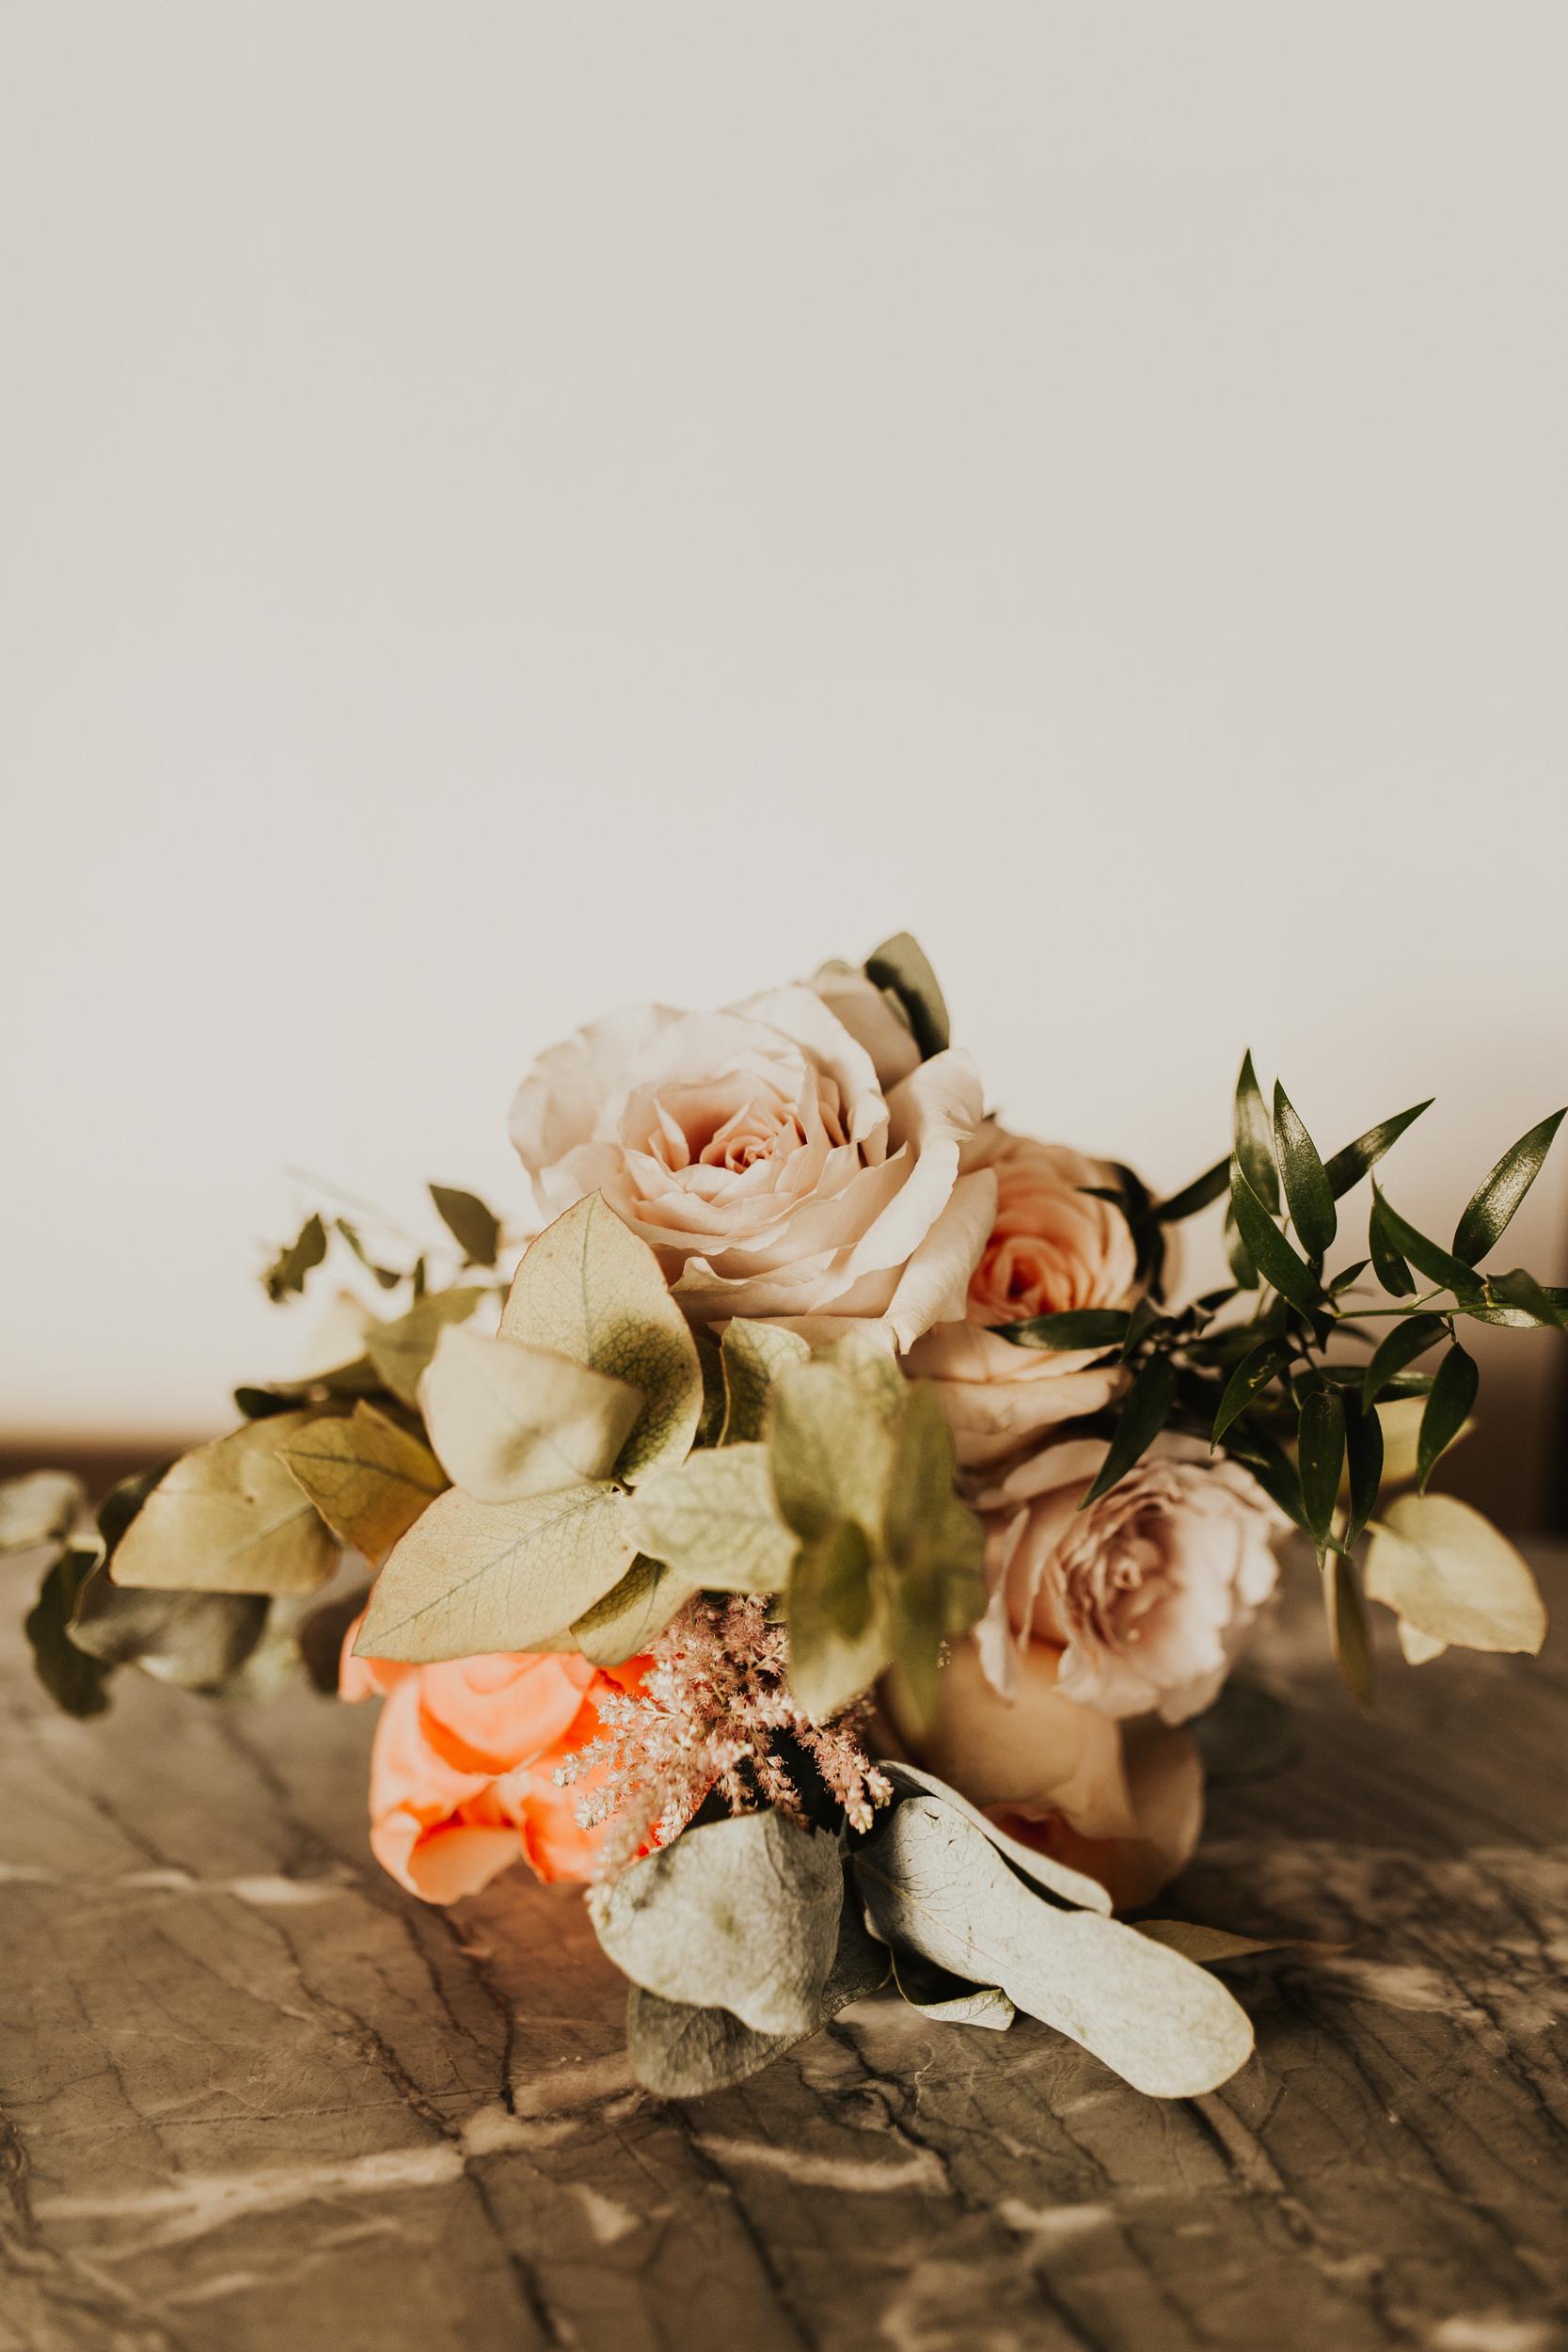 Laura-Benn-The-Asylum-London-The-Ace-Hotel-Wedding-Alternative-Darina-Stoda-Photography-599.jpg